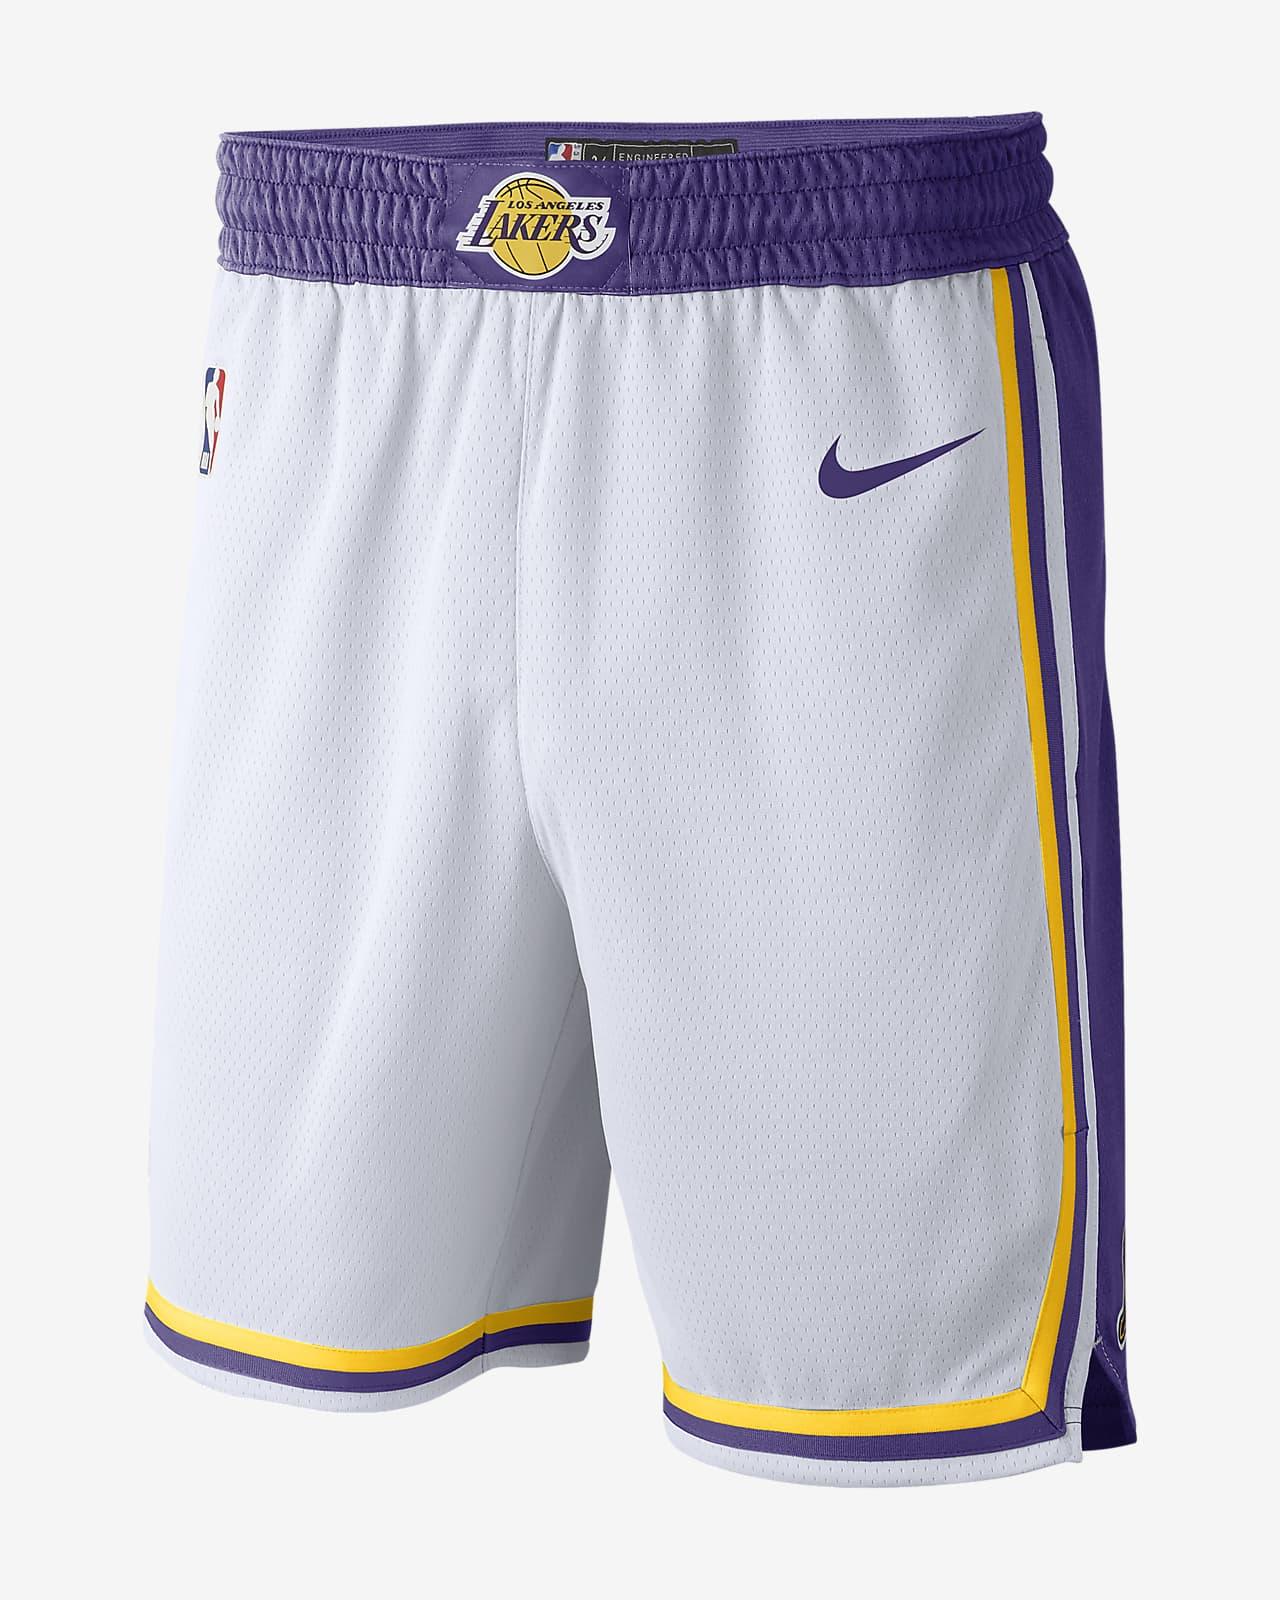 Calções NBA Nike Swingman Los Angeles Lakers para homem